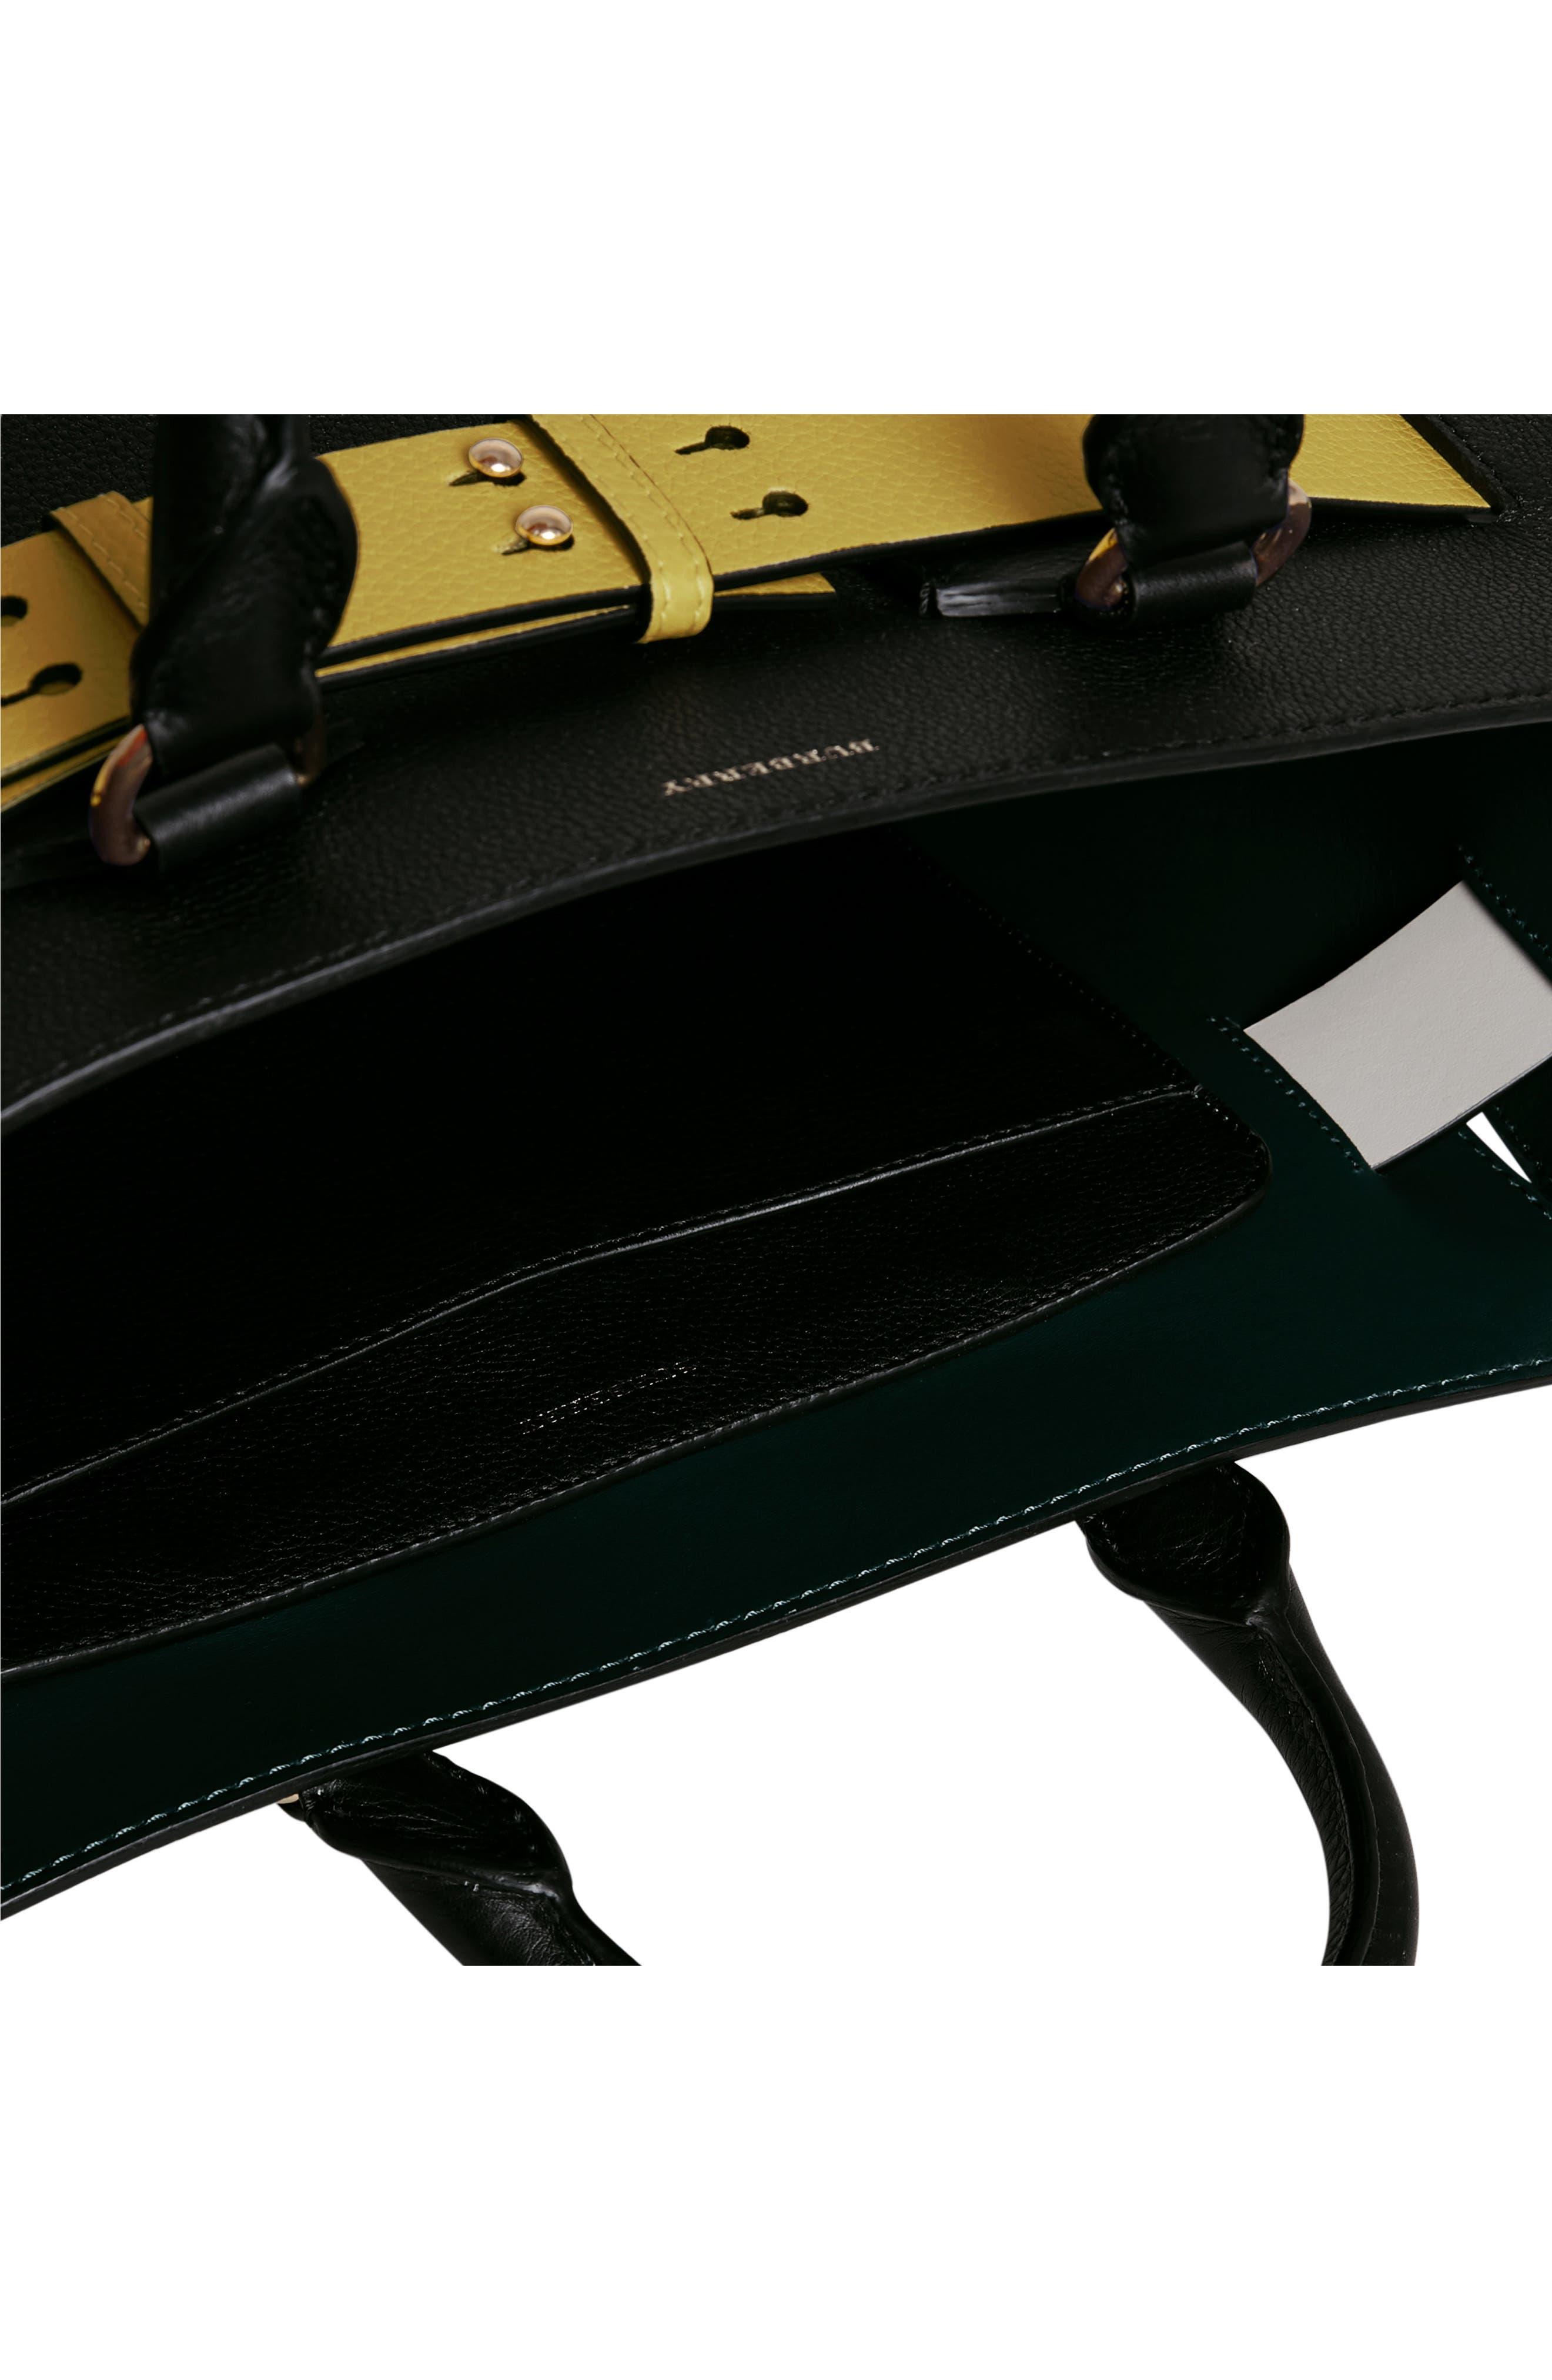 Medium Belt Bag Leather Tote,                             Alternate thumbnail 10, color,                             001